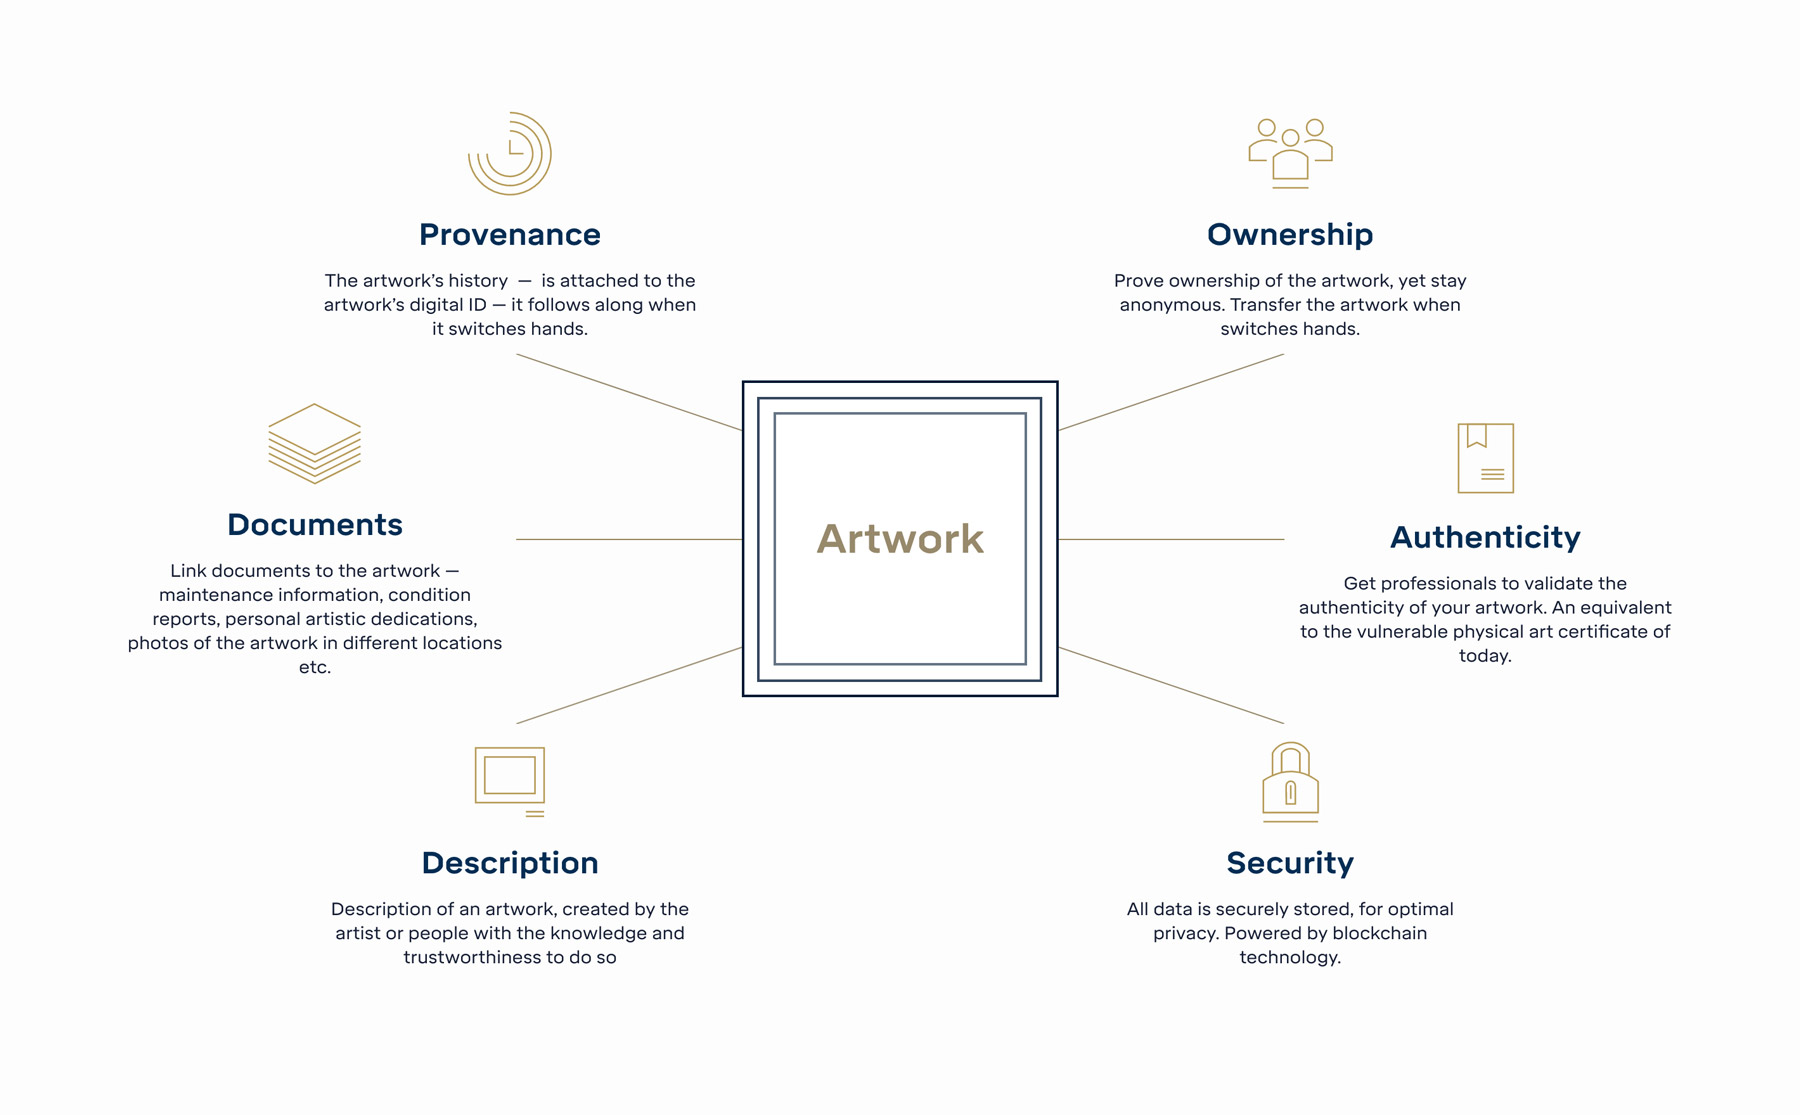 Illustrating the Fernis business idea